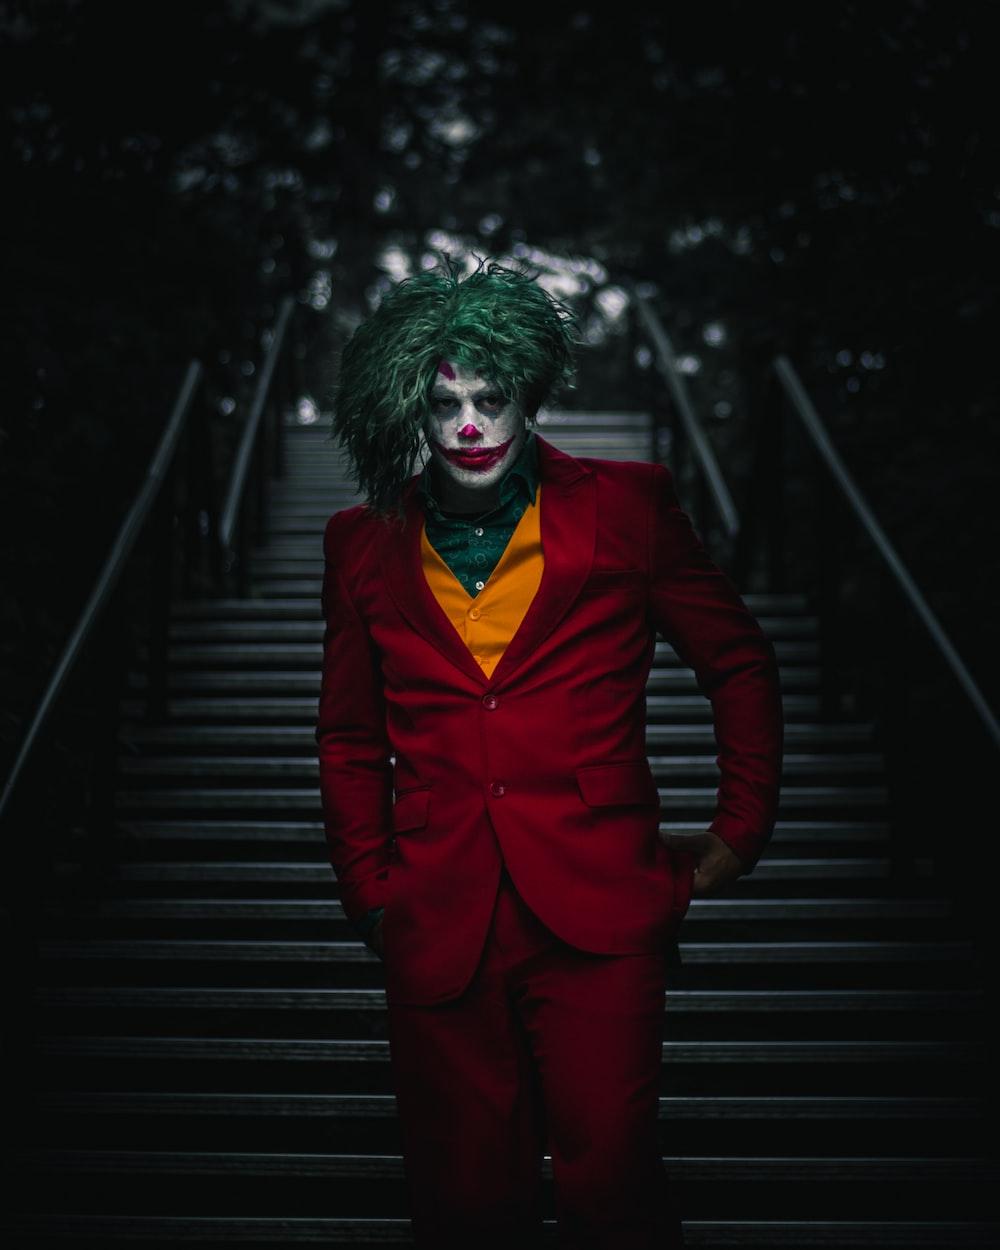 person wearing The Joker costume